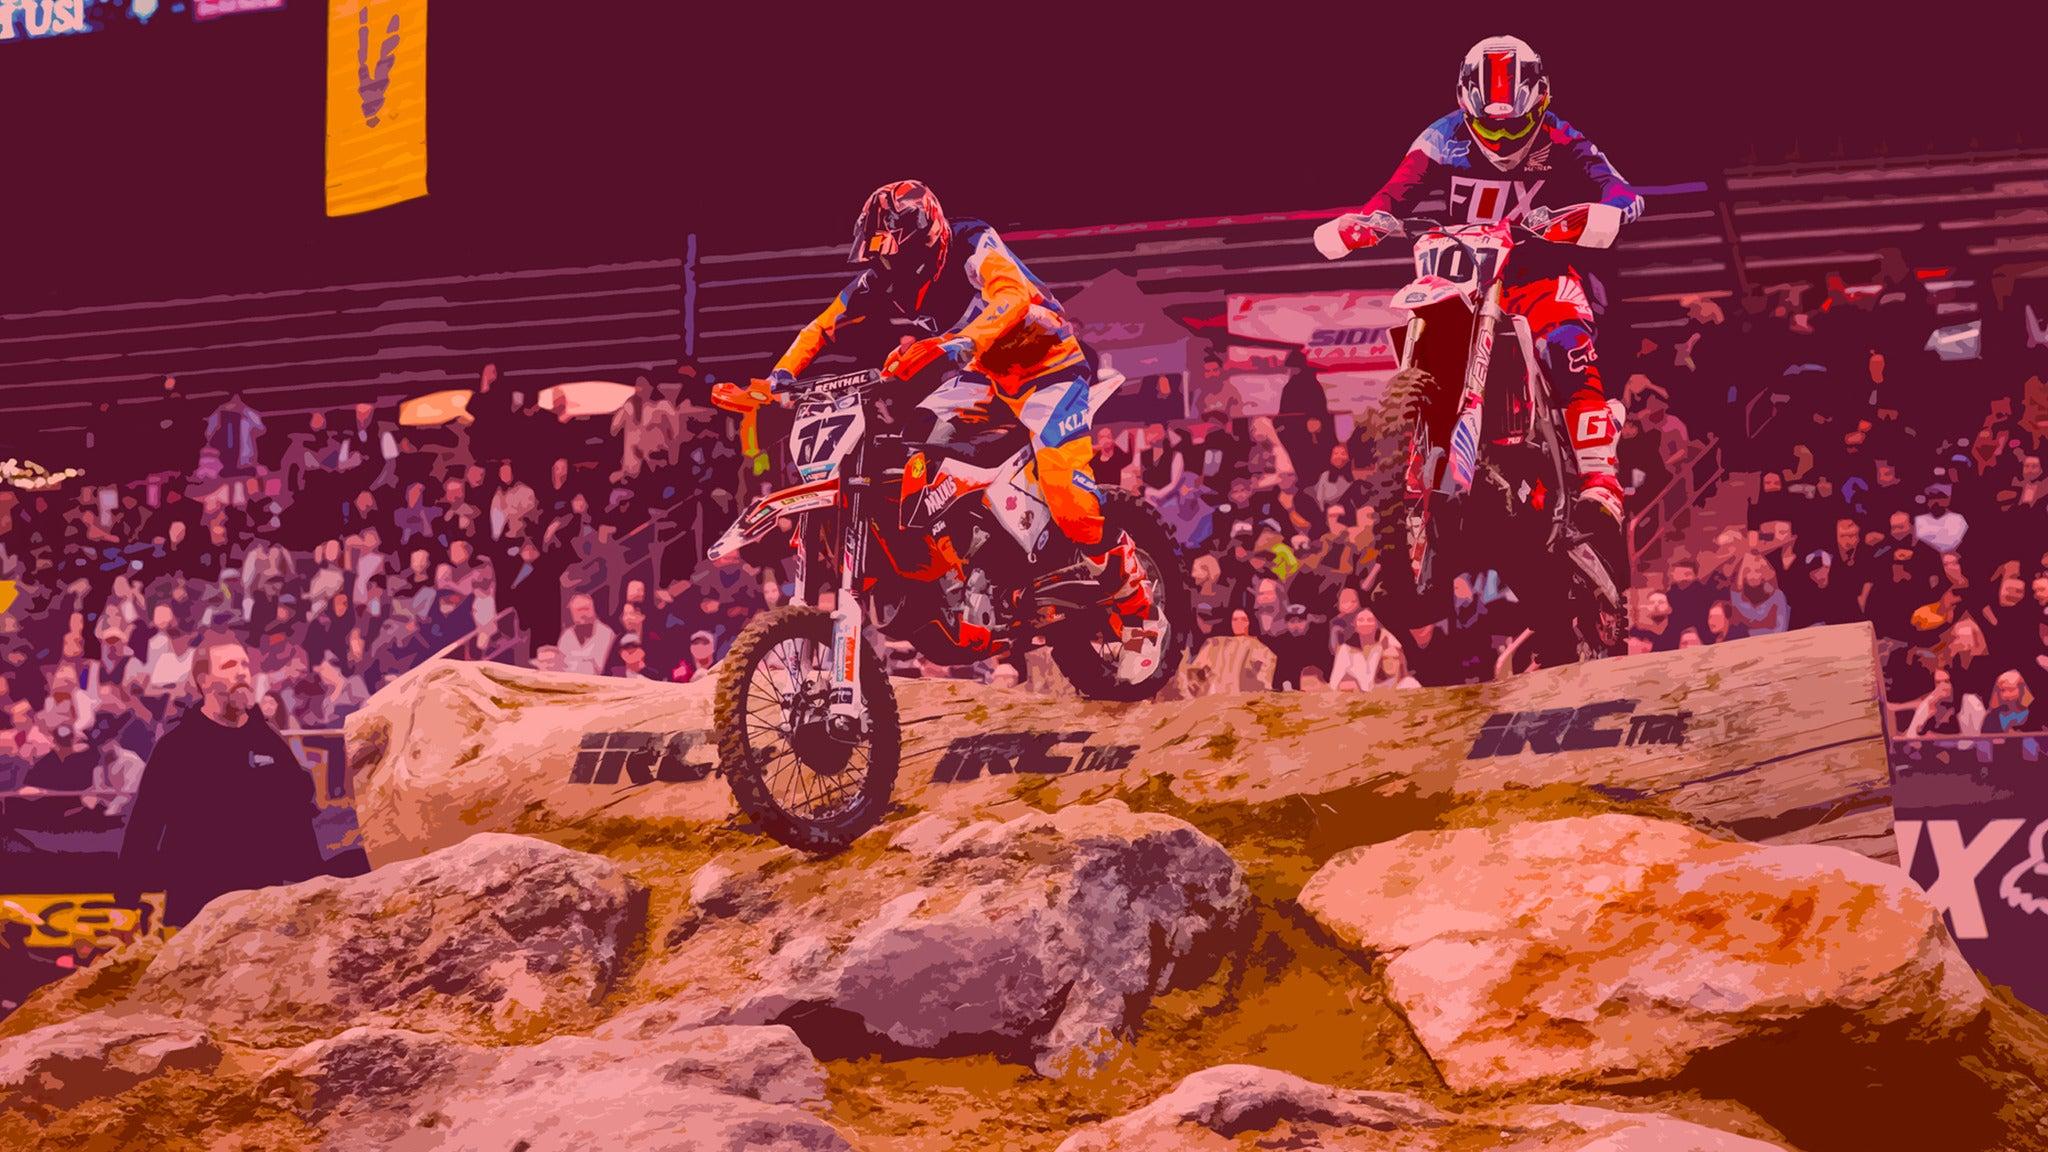 Endurocross presale passcode for show tickets in Prescott Valley, AZ (Findlay Toyota Center)